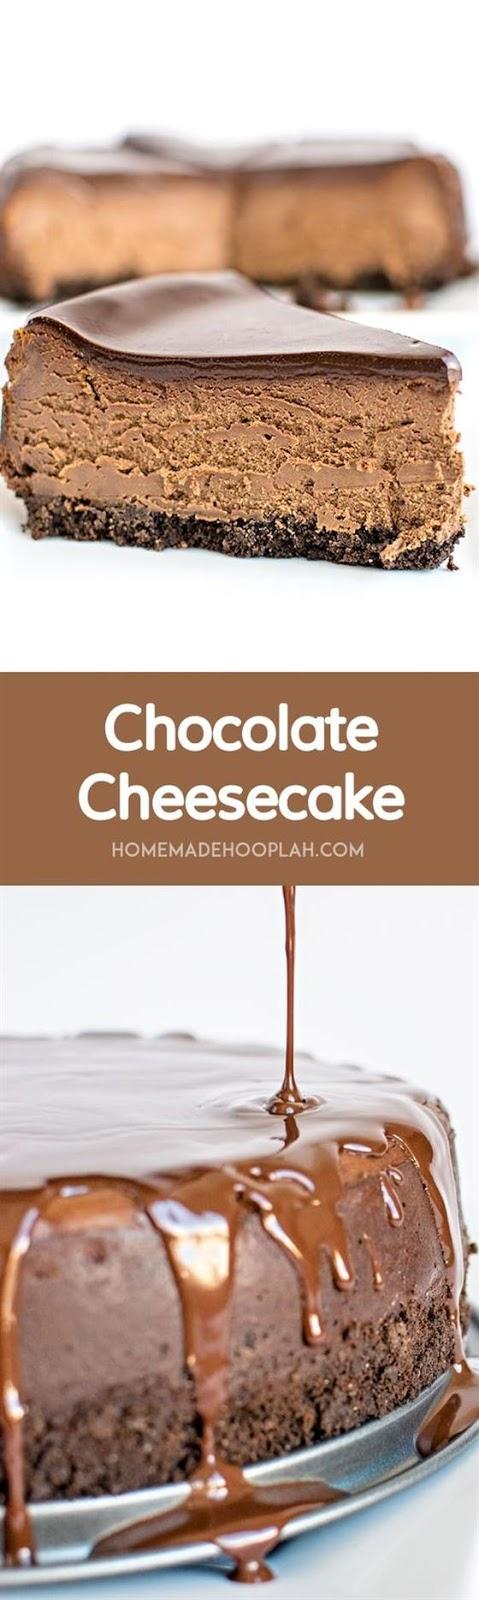 Chocolate Cheesecake #Choco #Chcolate #Chocorecipe #Cheesecake #cheesecakechoco #Bestcake #Cakerrecipe